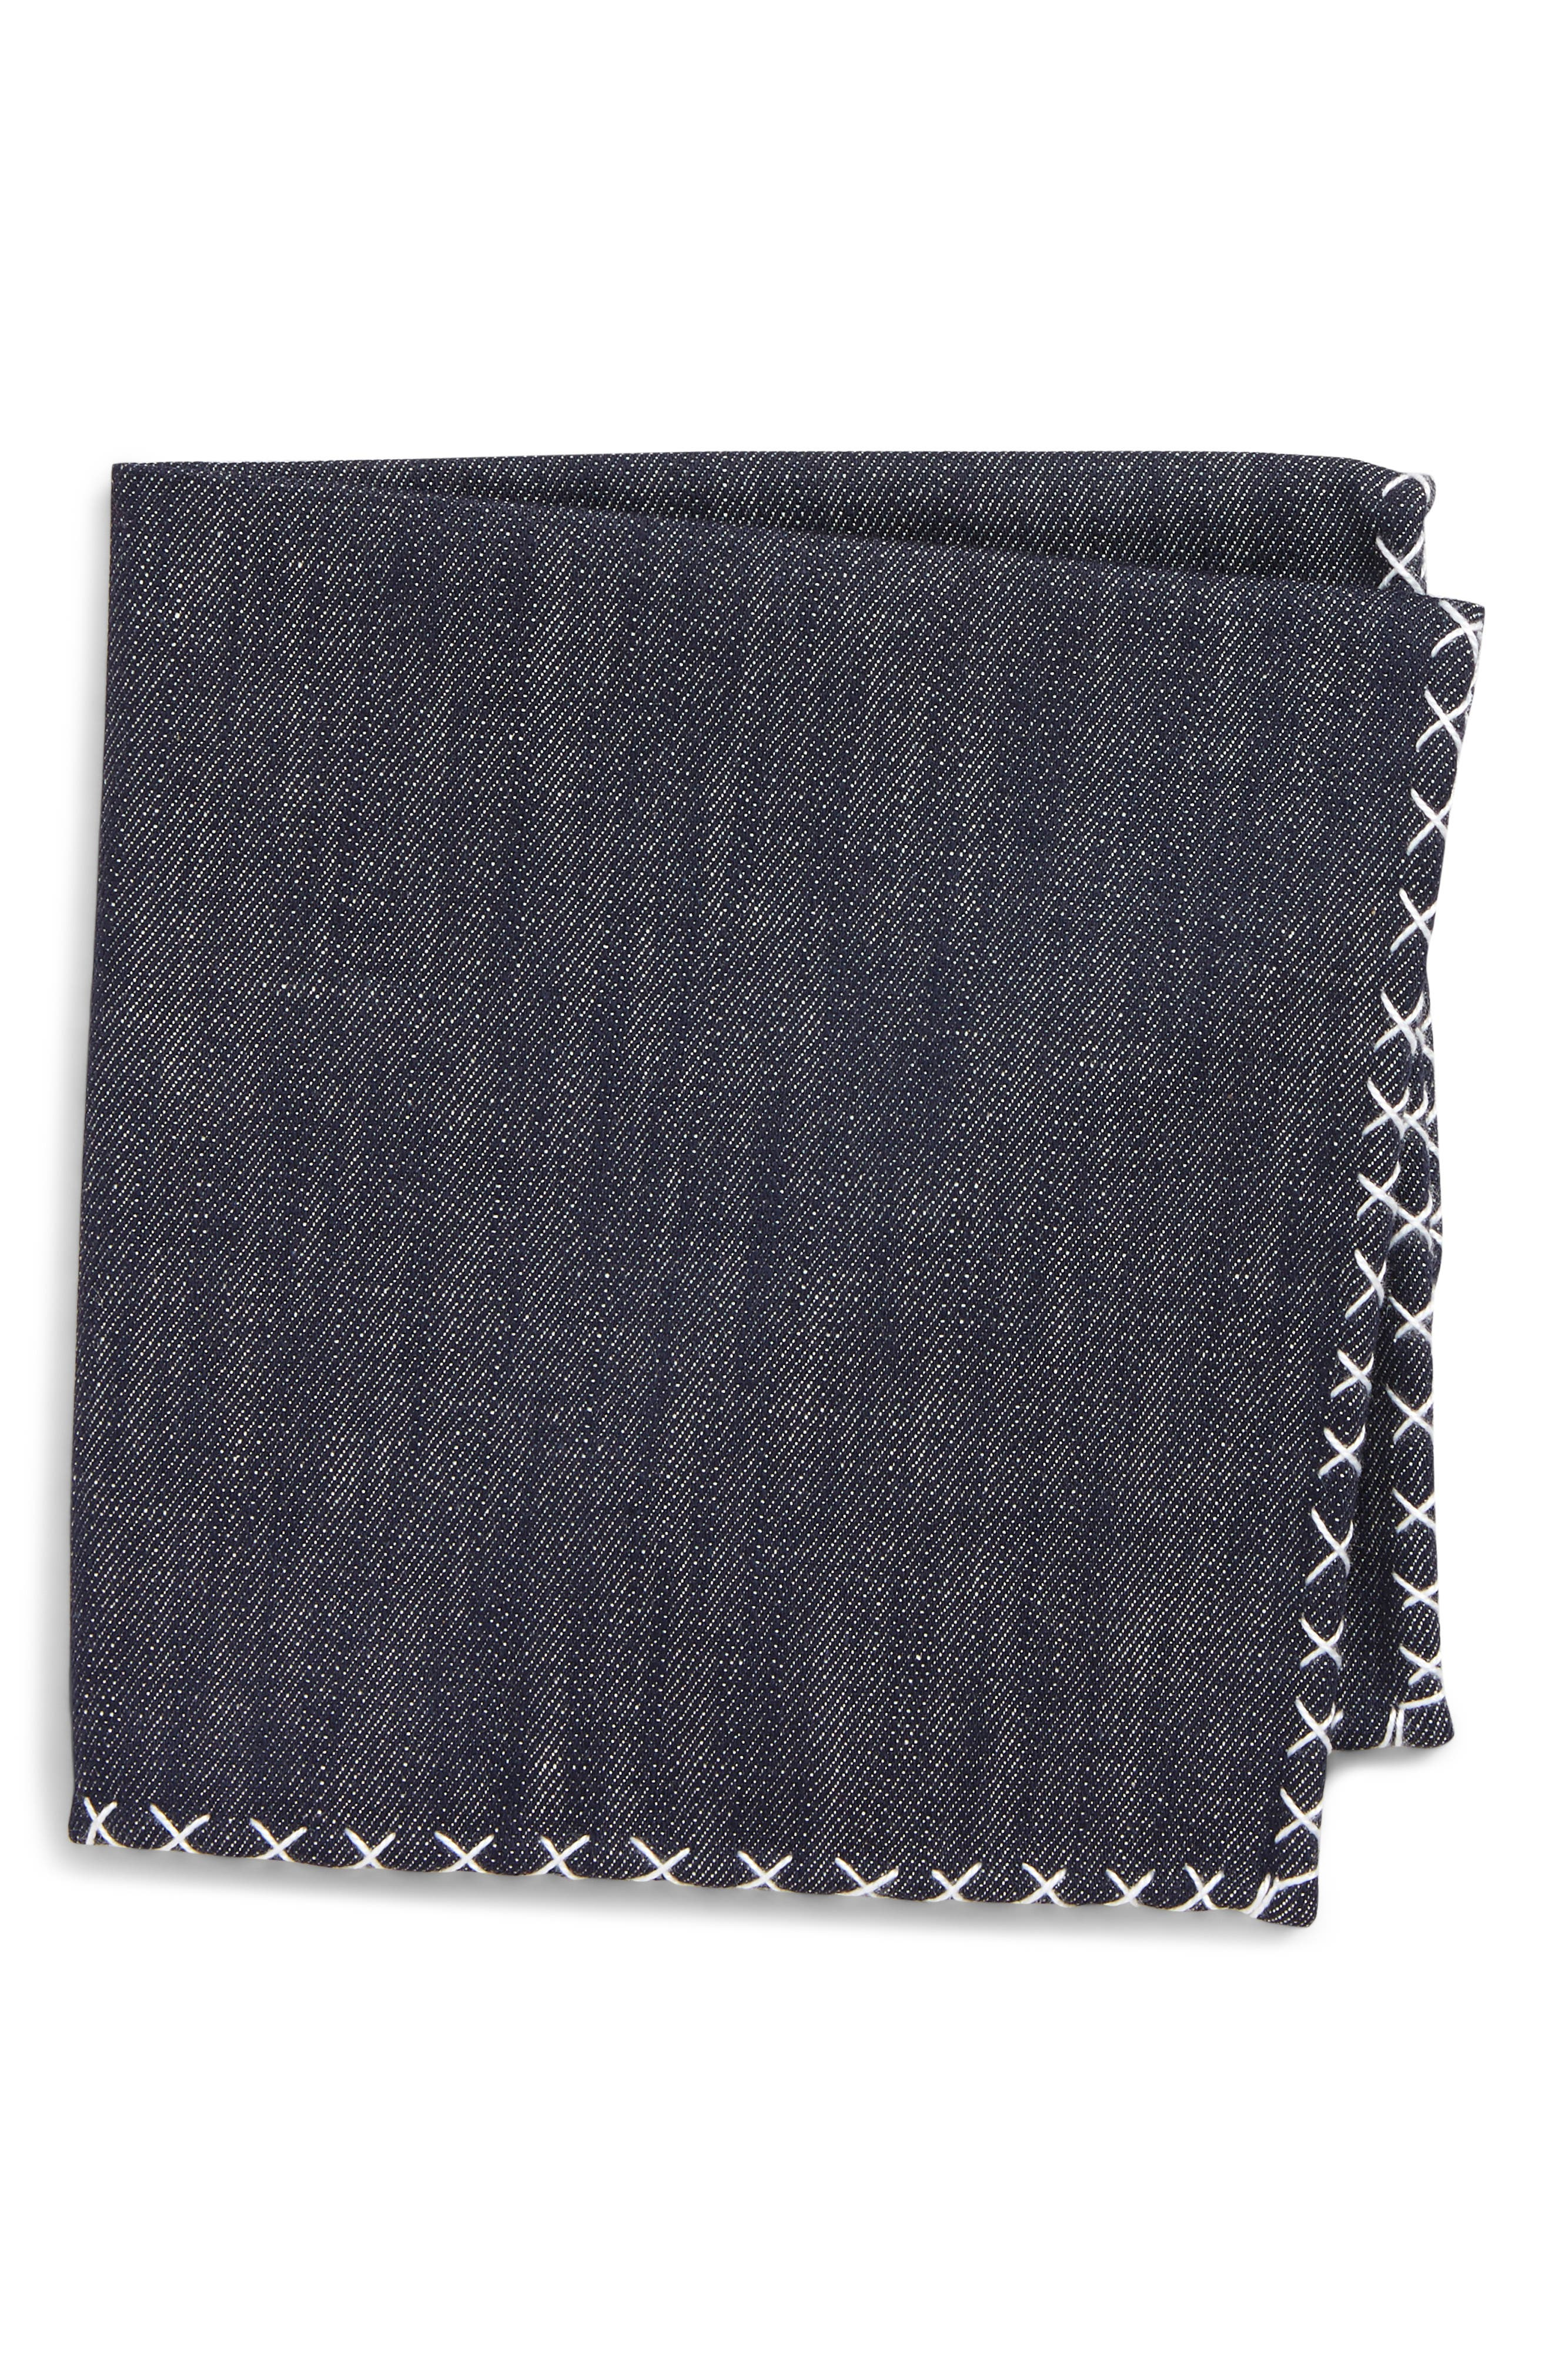 ELEVENTY, Denim Cotton Pocket Square, Main thumbnail 1, color, DENIM/ WHITE